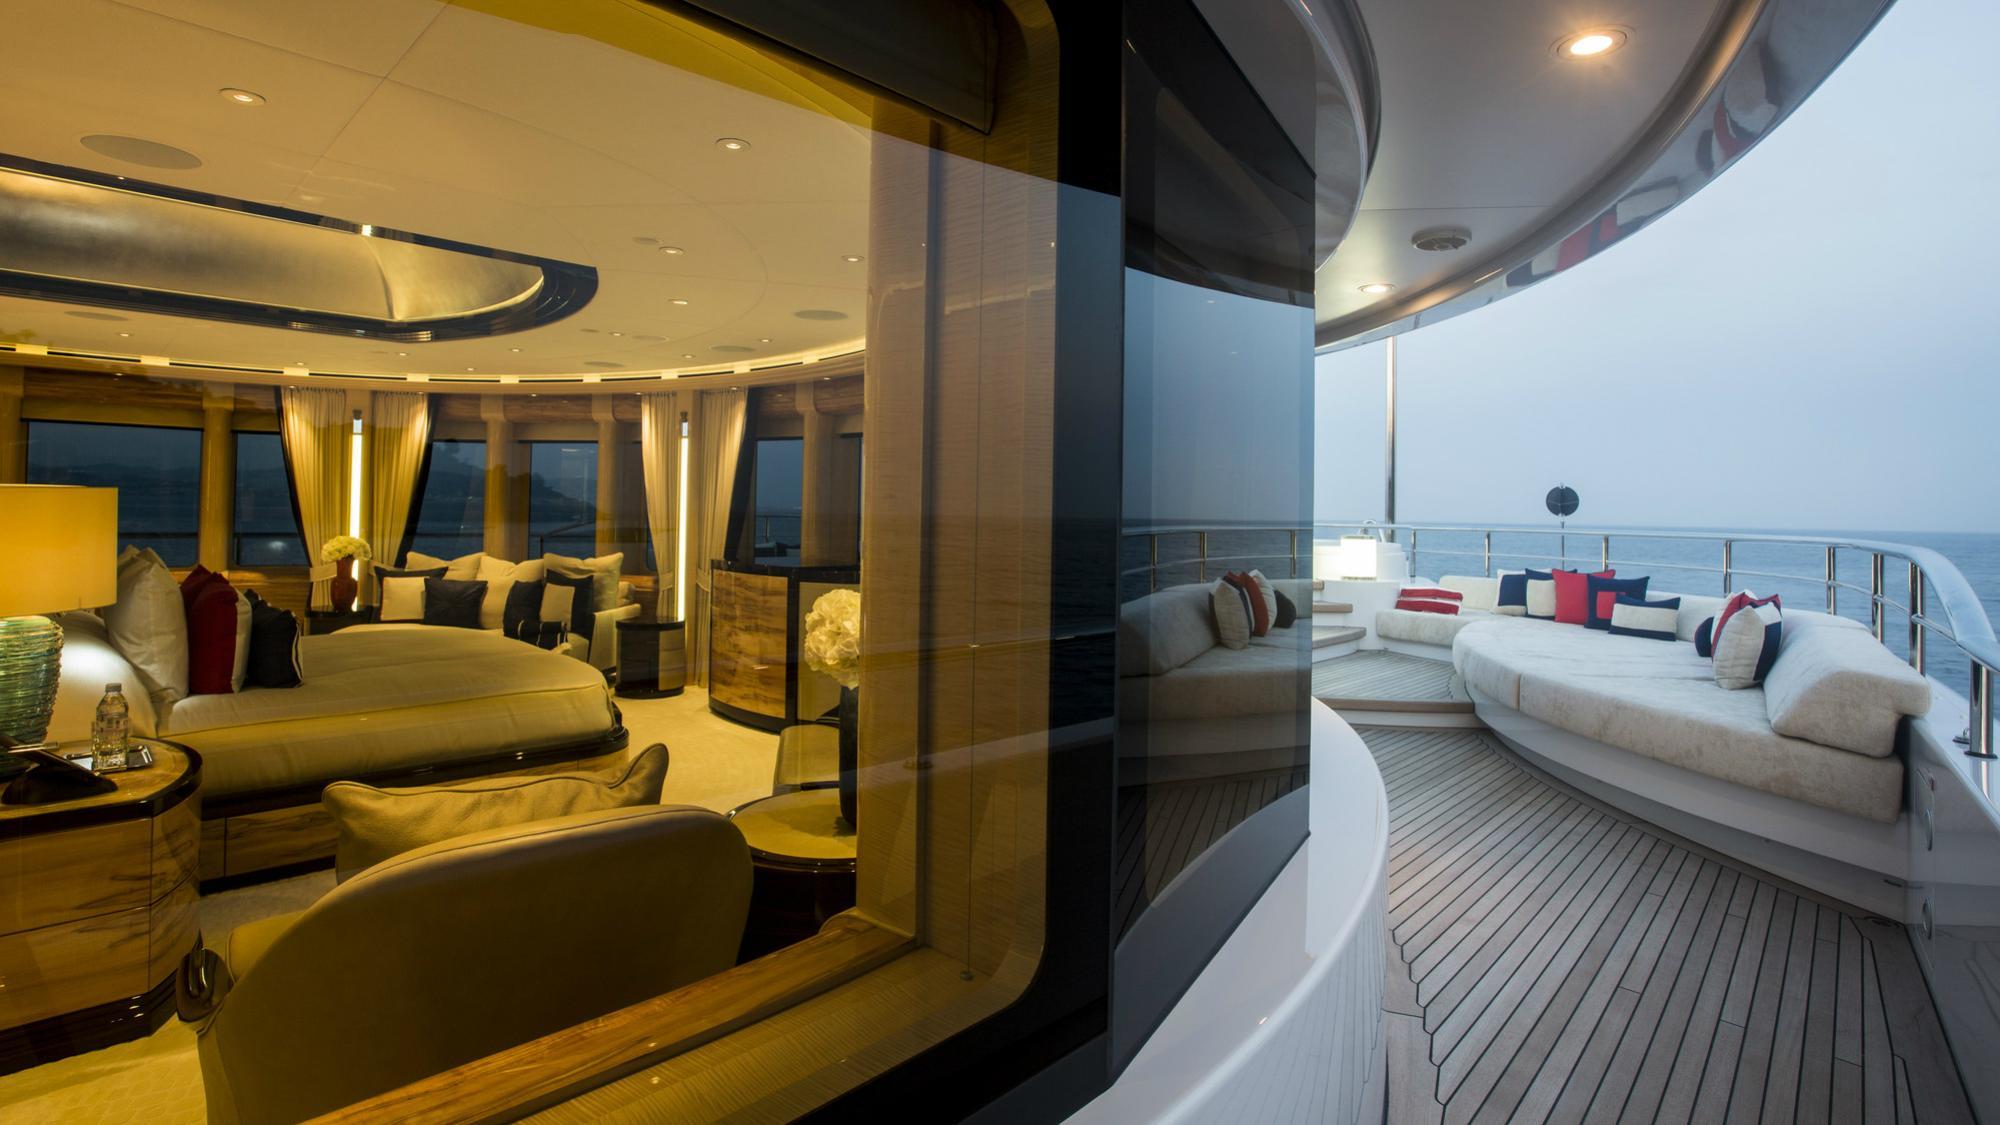 Excellence-V-motor-yacht-abeking-rasmussen-2012-60m-master-cabin